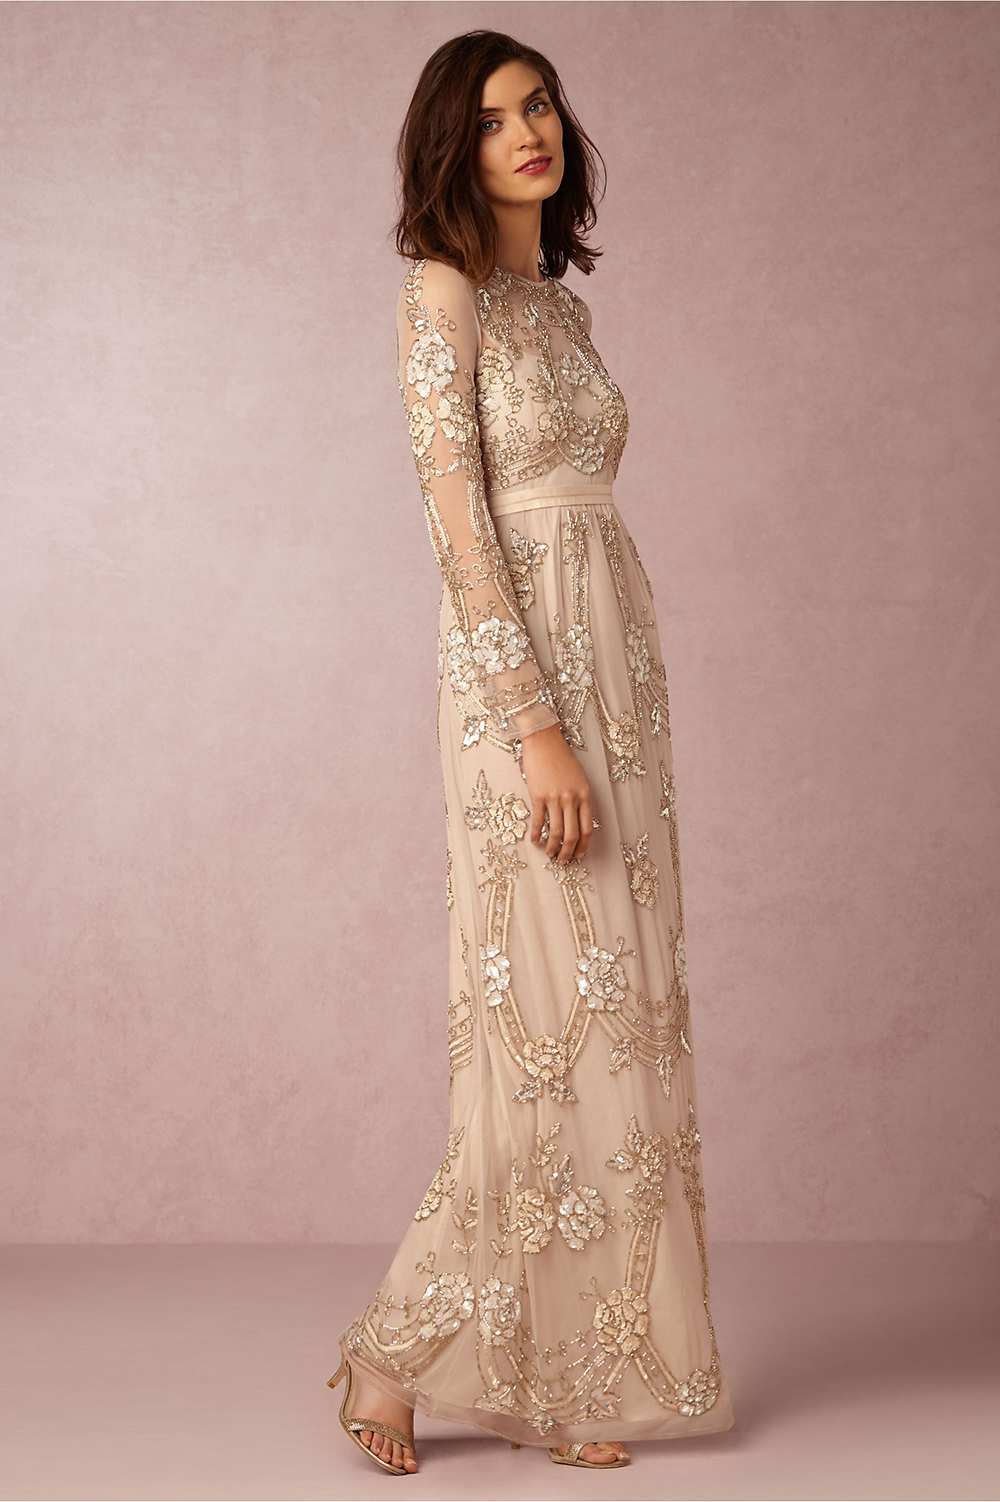 BHLDN Adona Dress - BHLDN Wedding Gowns